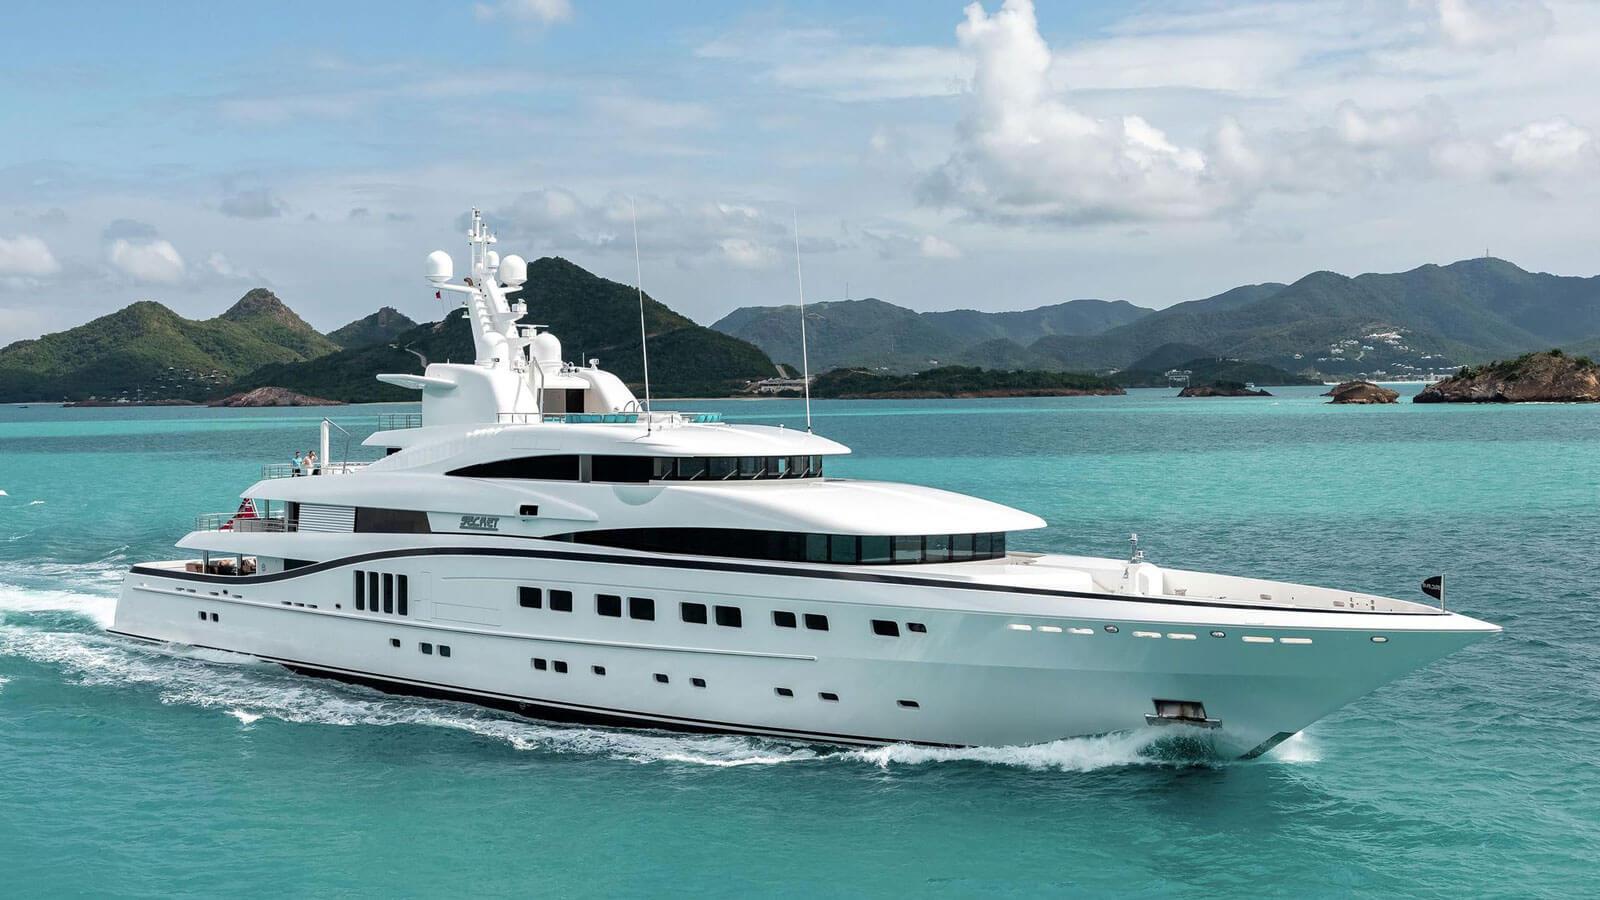 Elite Super Yachts